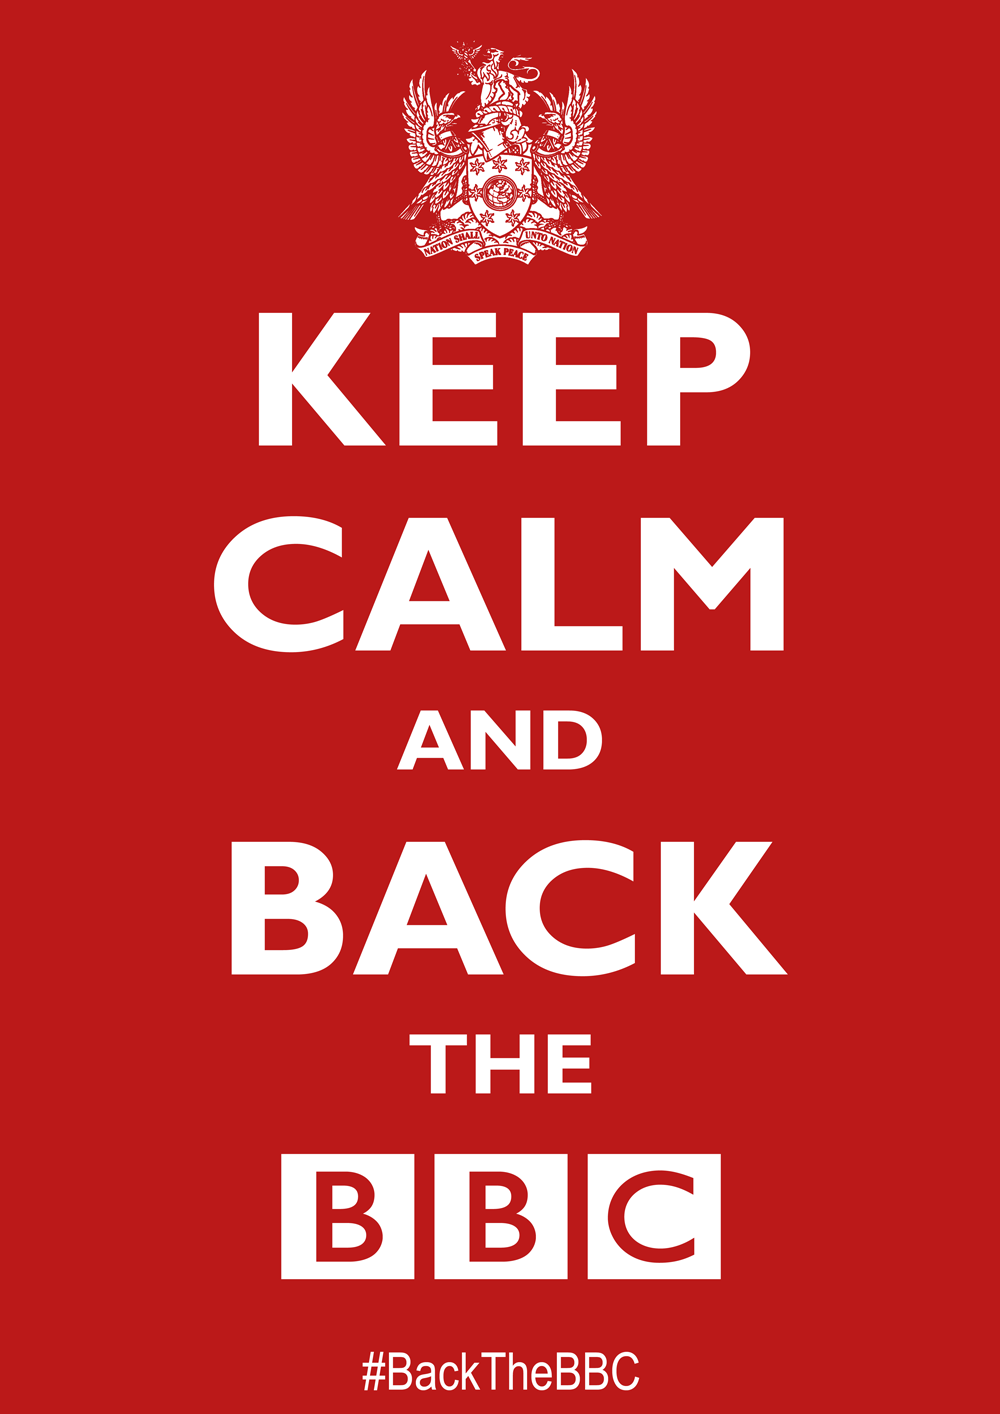 #BackTheBBC